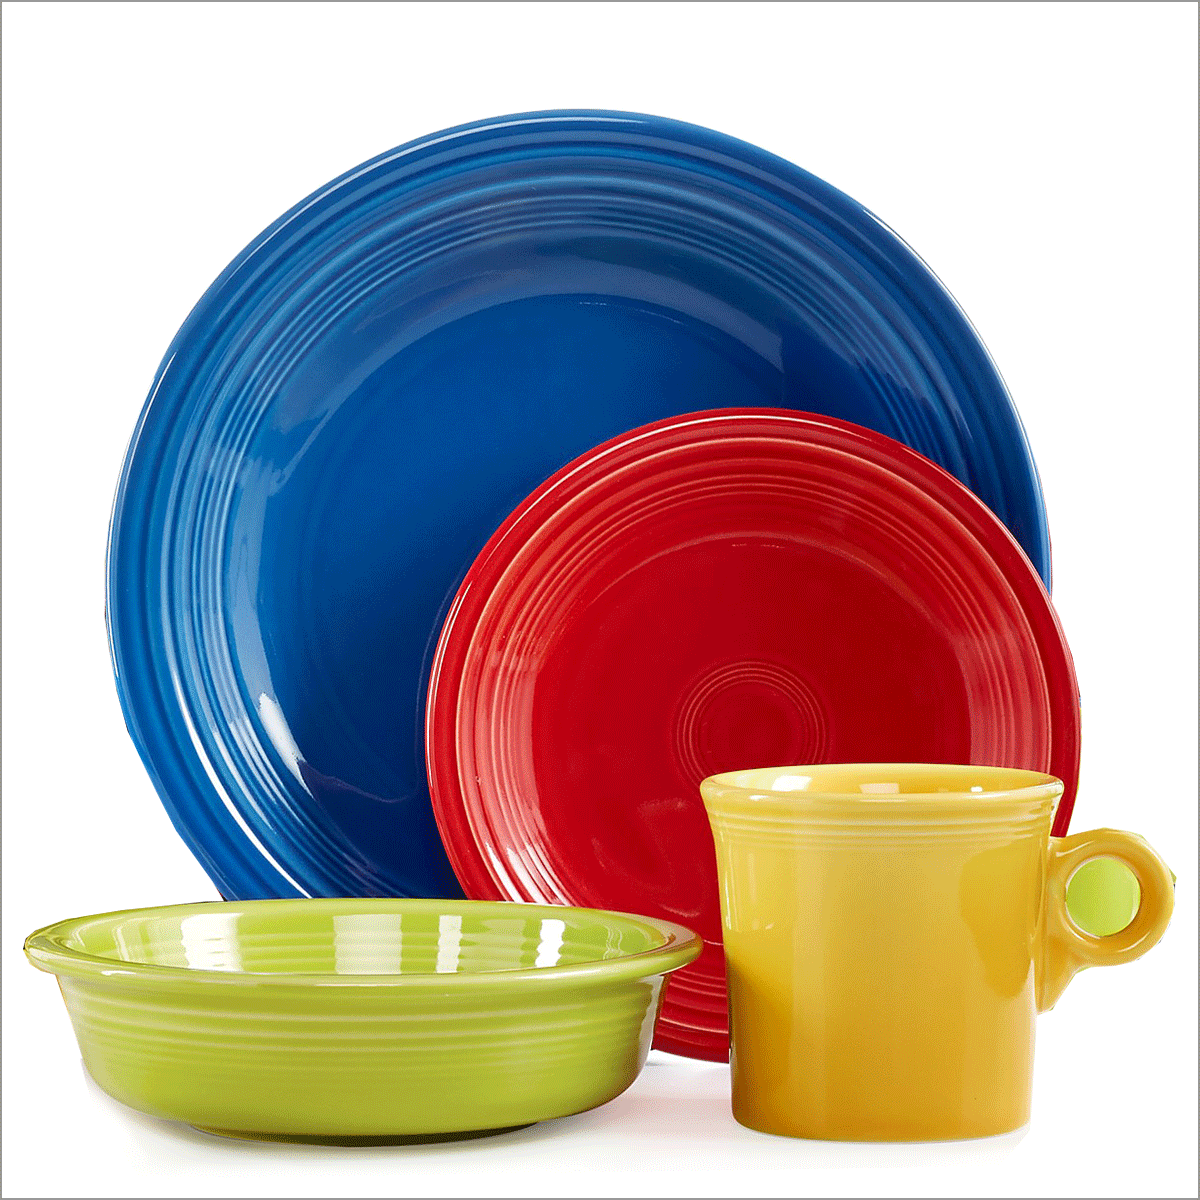 Dinnerware  sc 1 st  Macy\u0027s & Fiestaware Dishes Glasses Mugs \u0026 More - Macy\u0027s